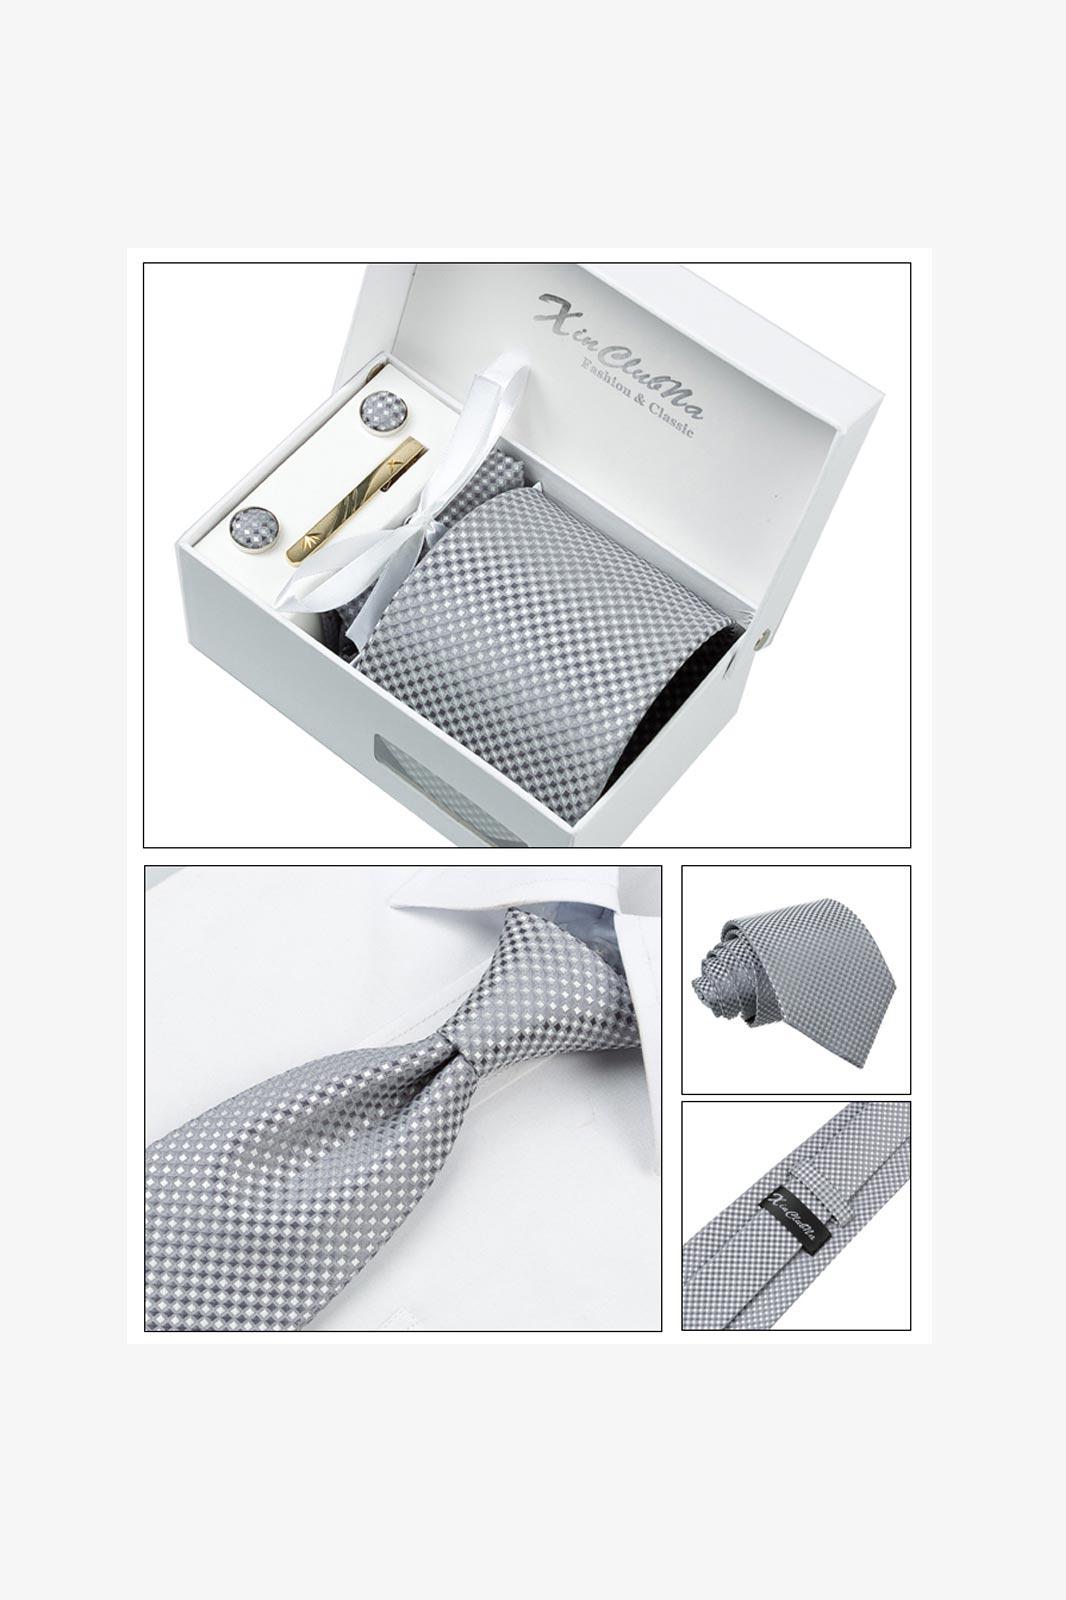 Mans ties silver gray checked gravata corbatas jacquard woven ties necktie set cufflink hanky business wedding holiday1